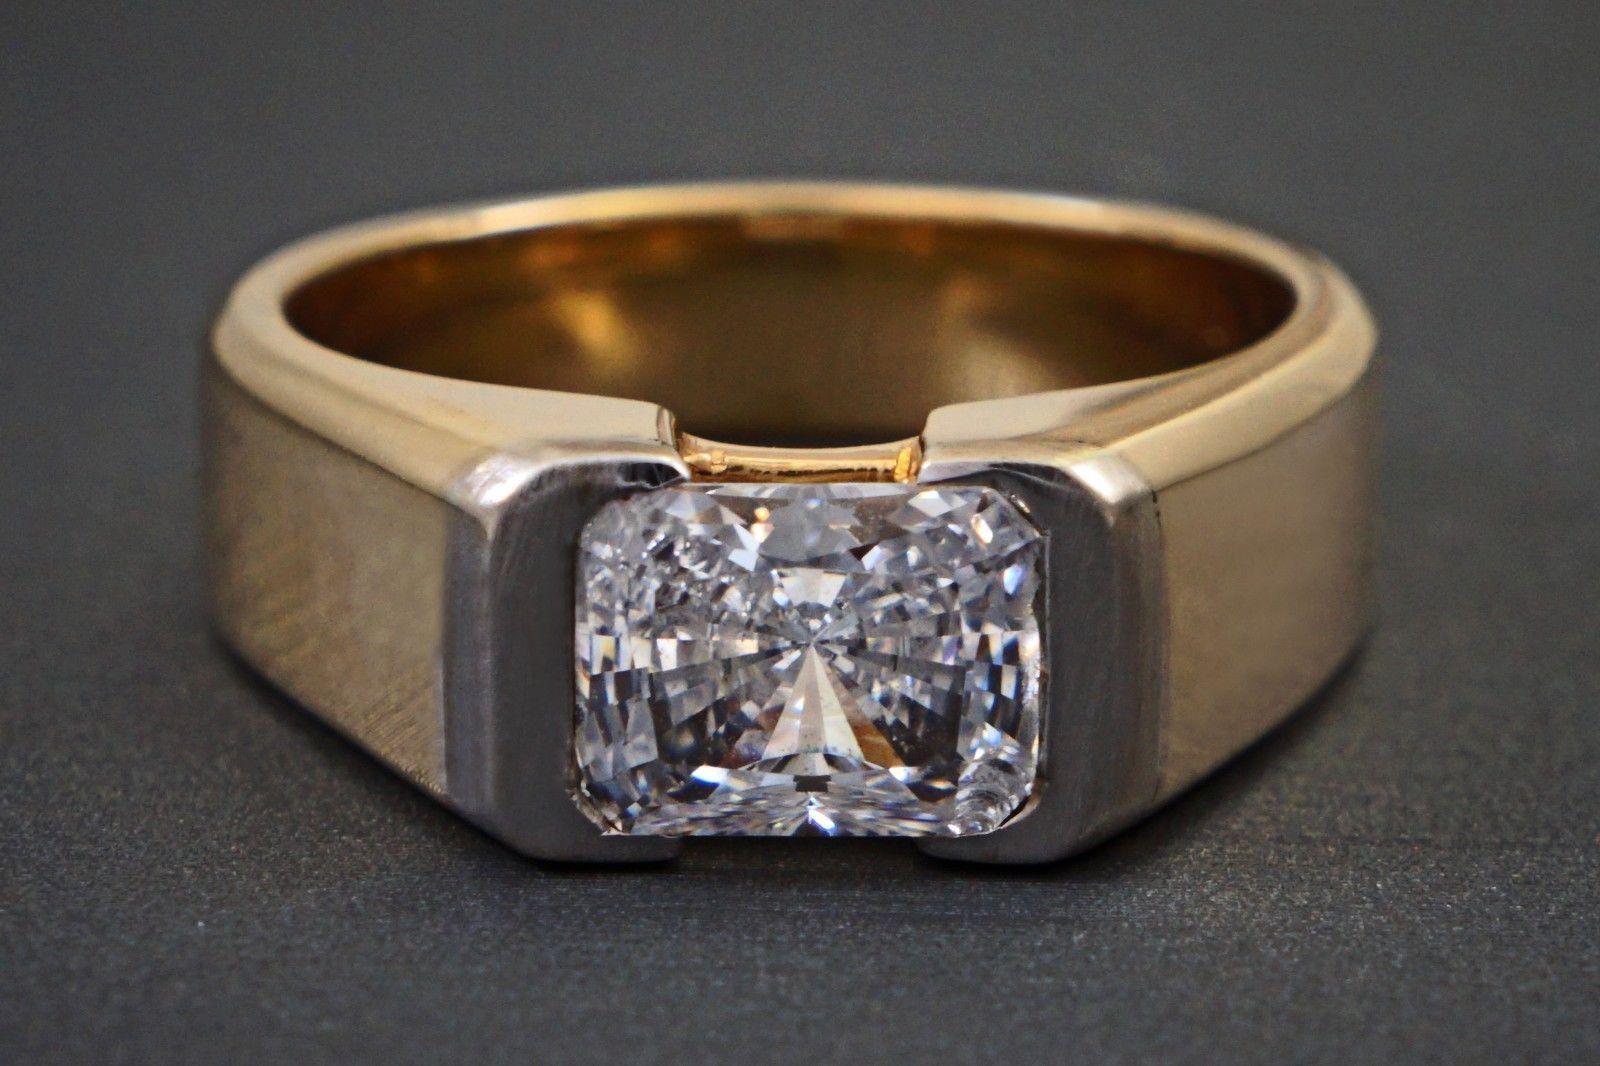 Ct radiant cut diamond in tone k yellow gold menus wedding